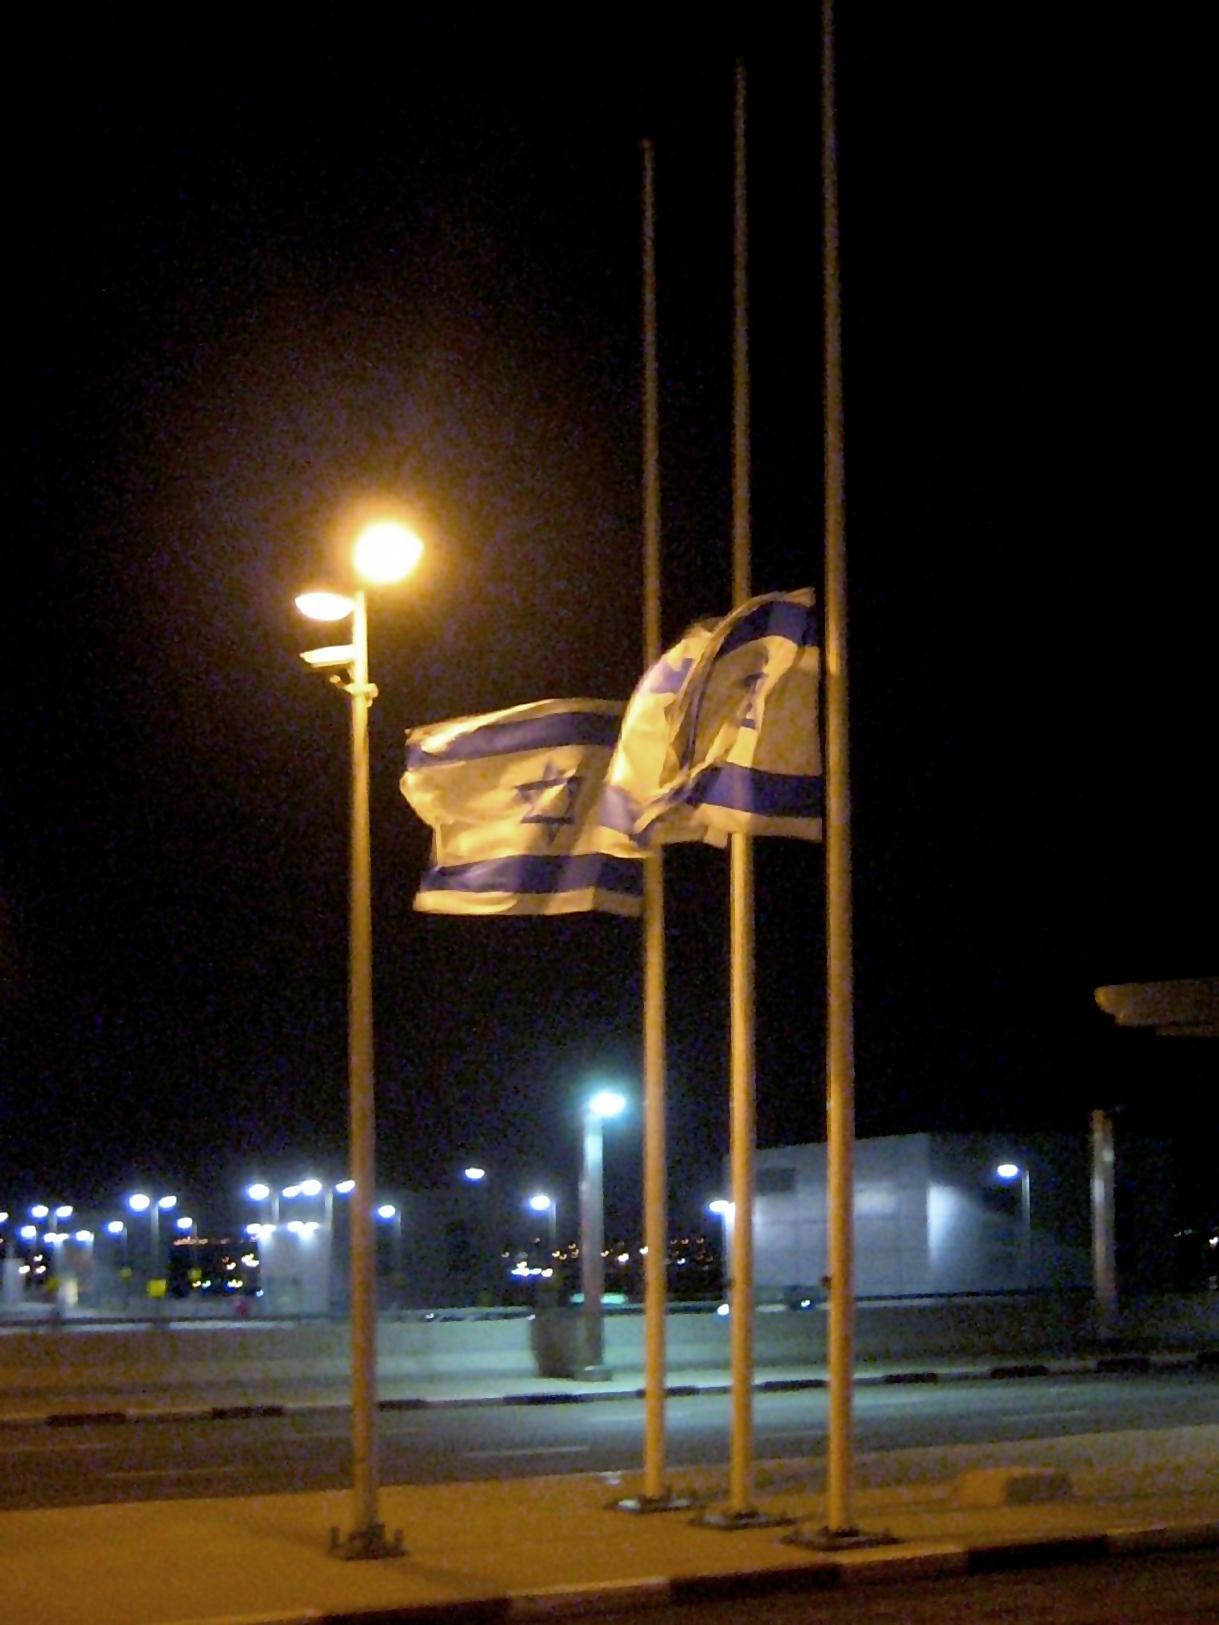 https://upload.wikimedia.org/wikipedia/commons/e/ea/Yom_HaShoah_Flags_halfmast.jpg